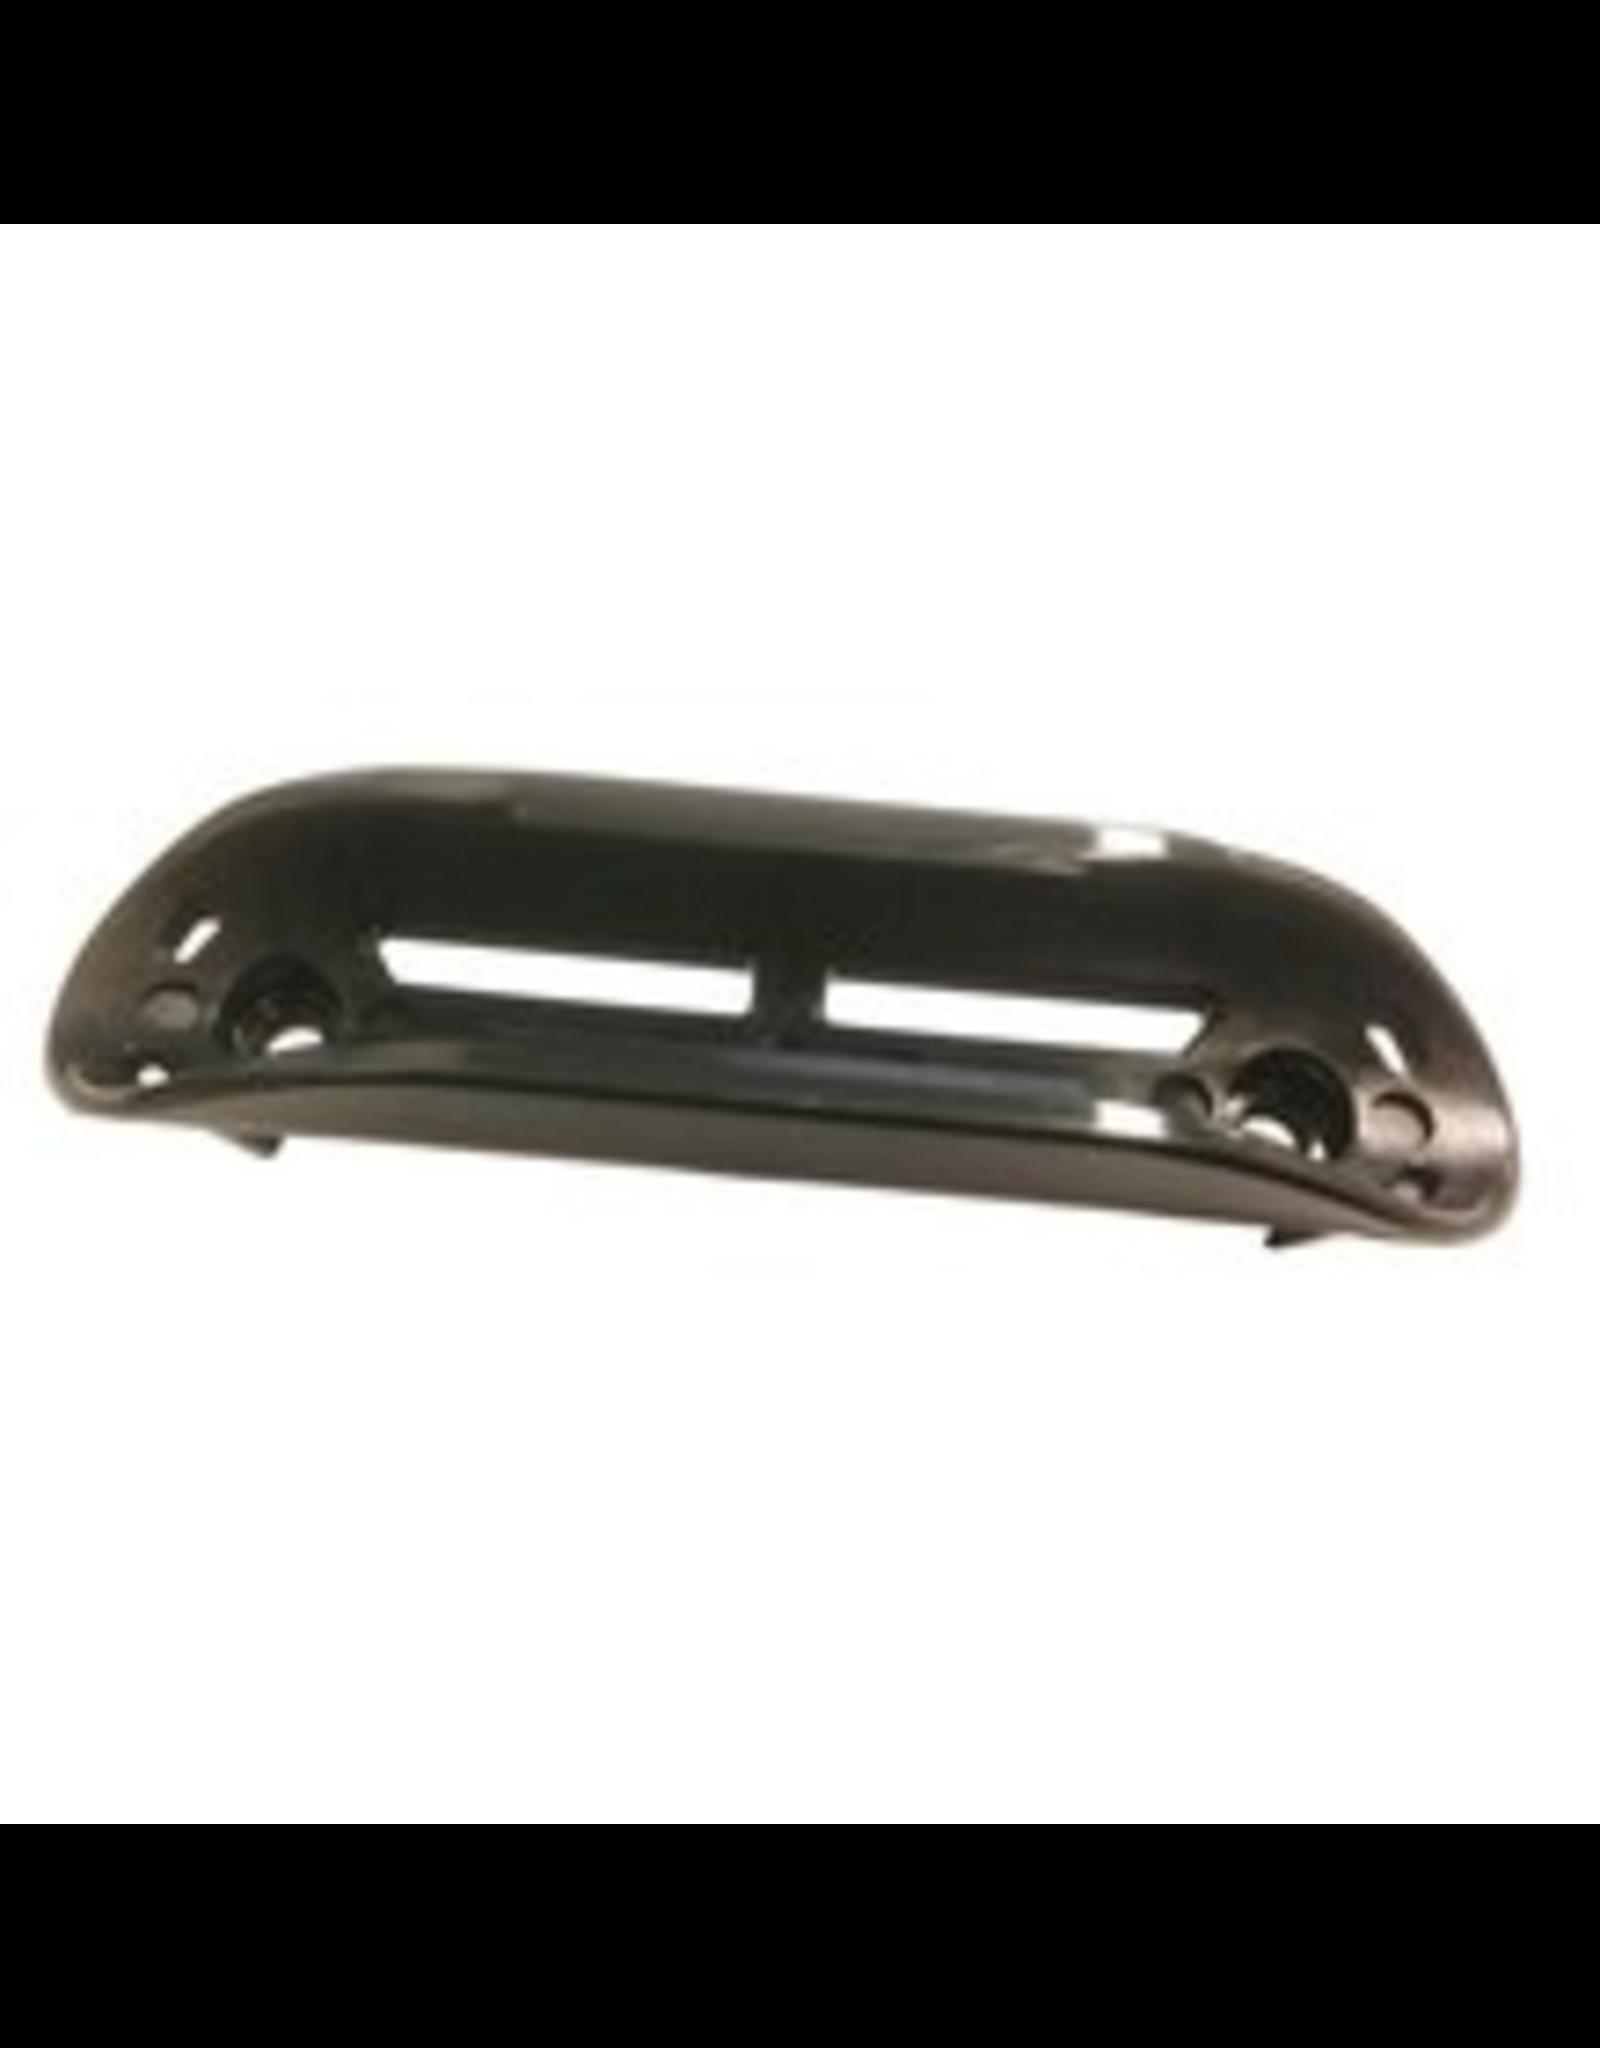 Hobie Hobie Paddle Clip for the Pro Angler